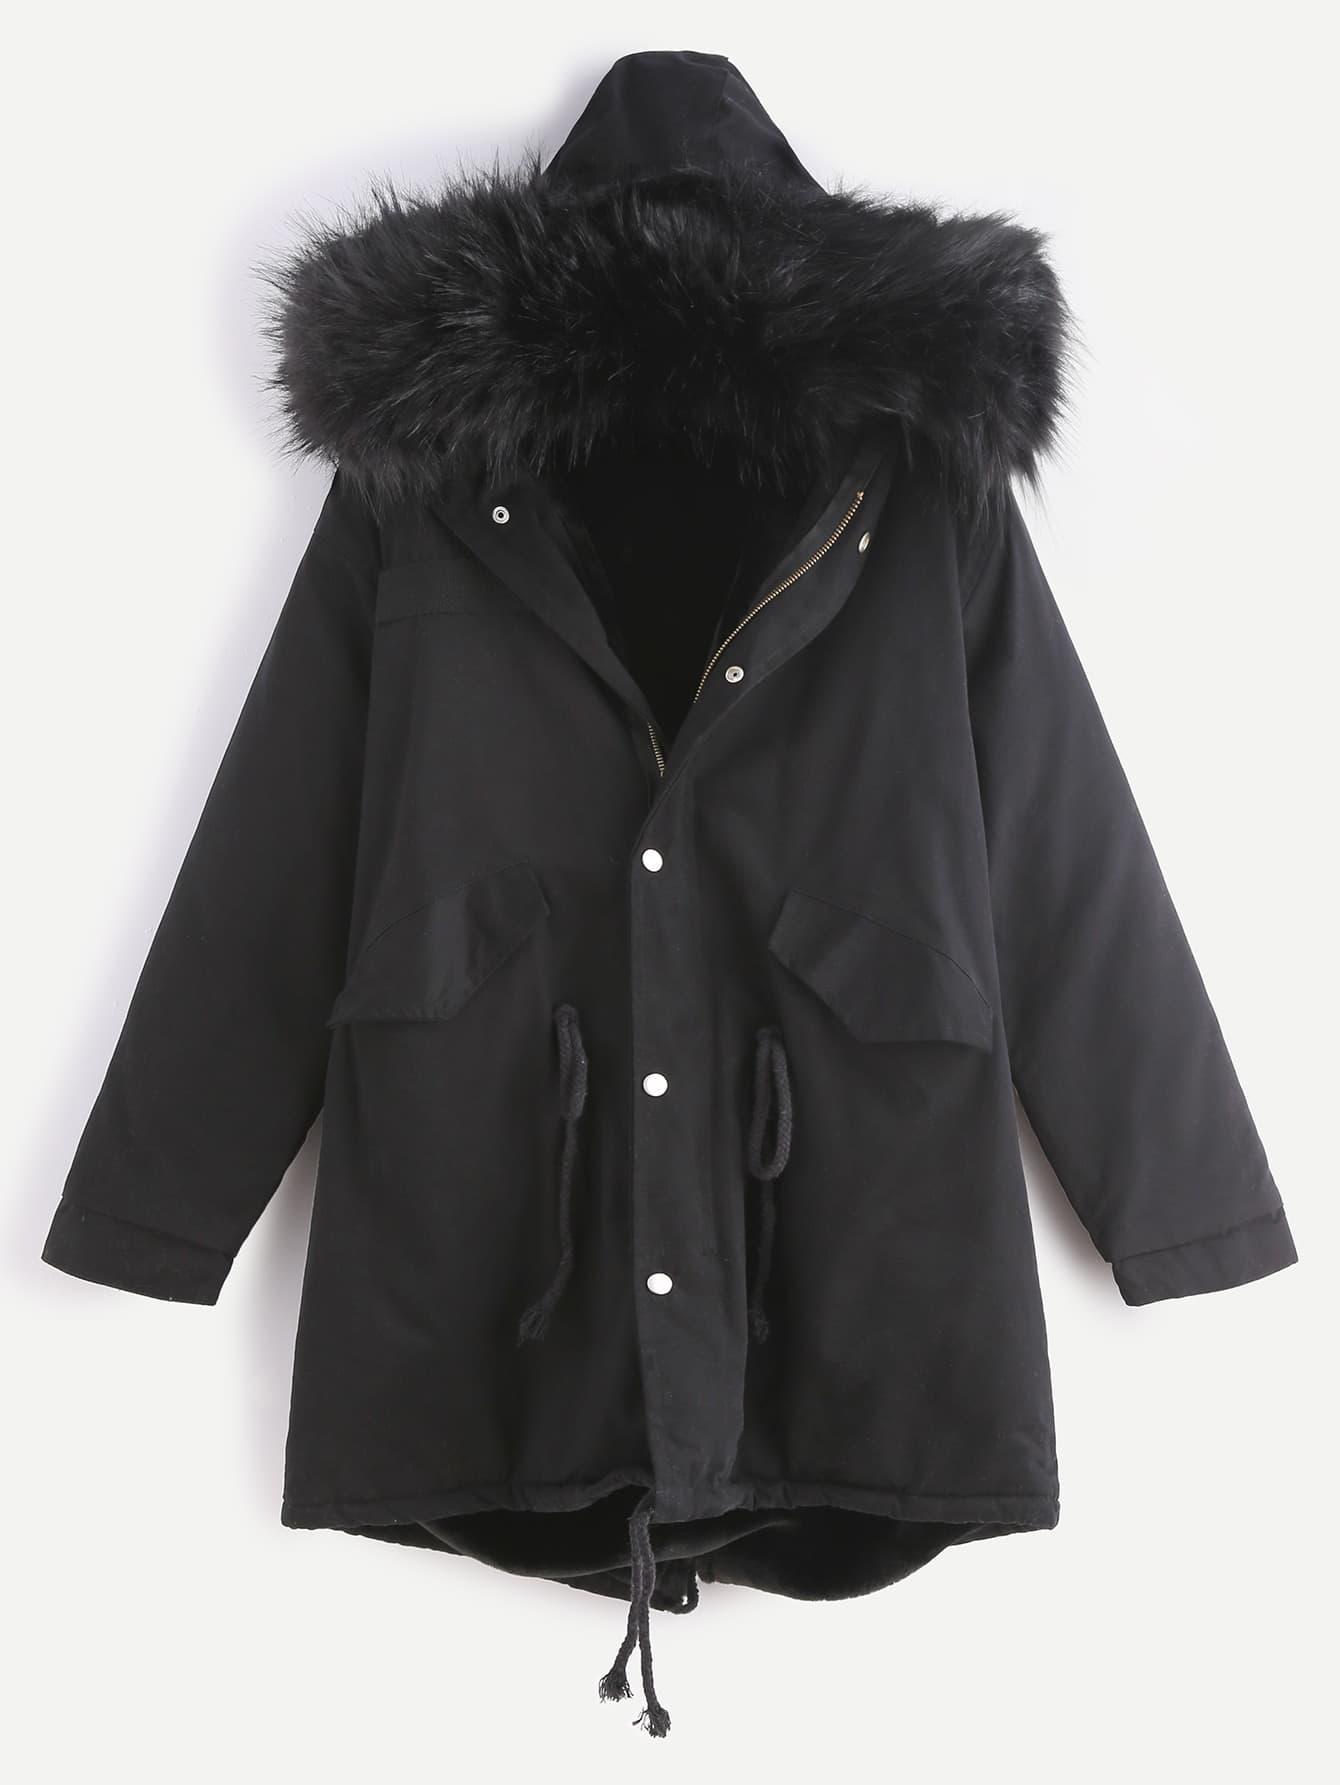 Black Drawstring Hooded Fleece Lined Faux Fur Trim Parka